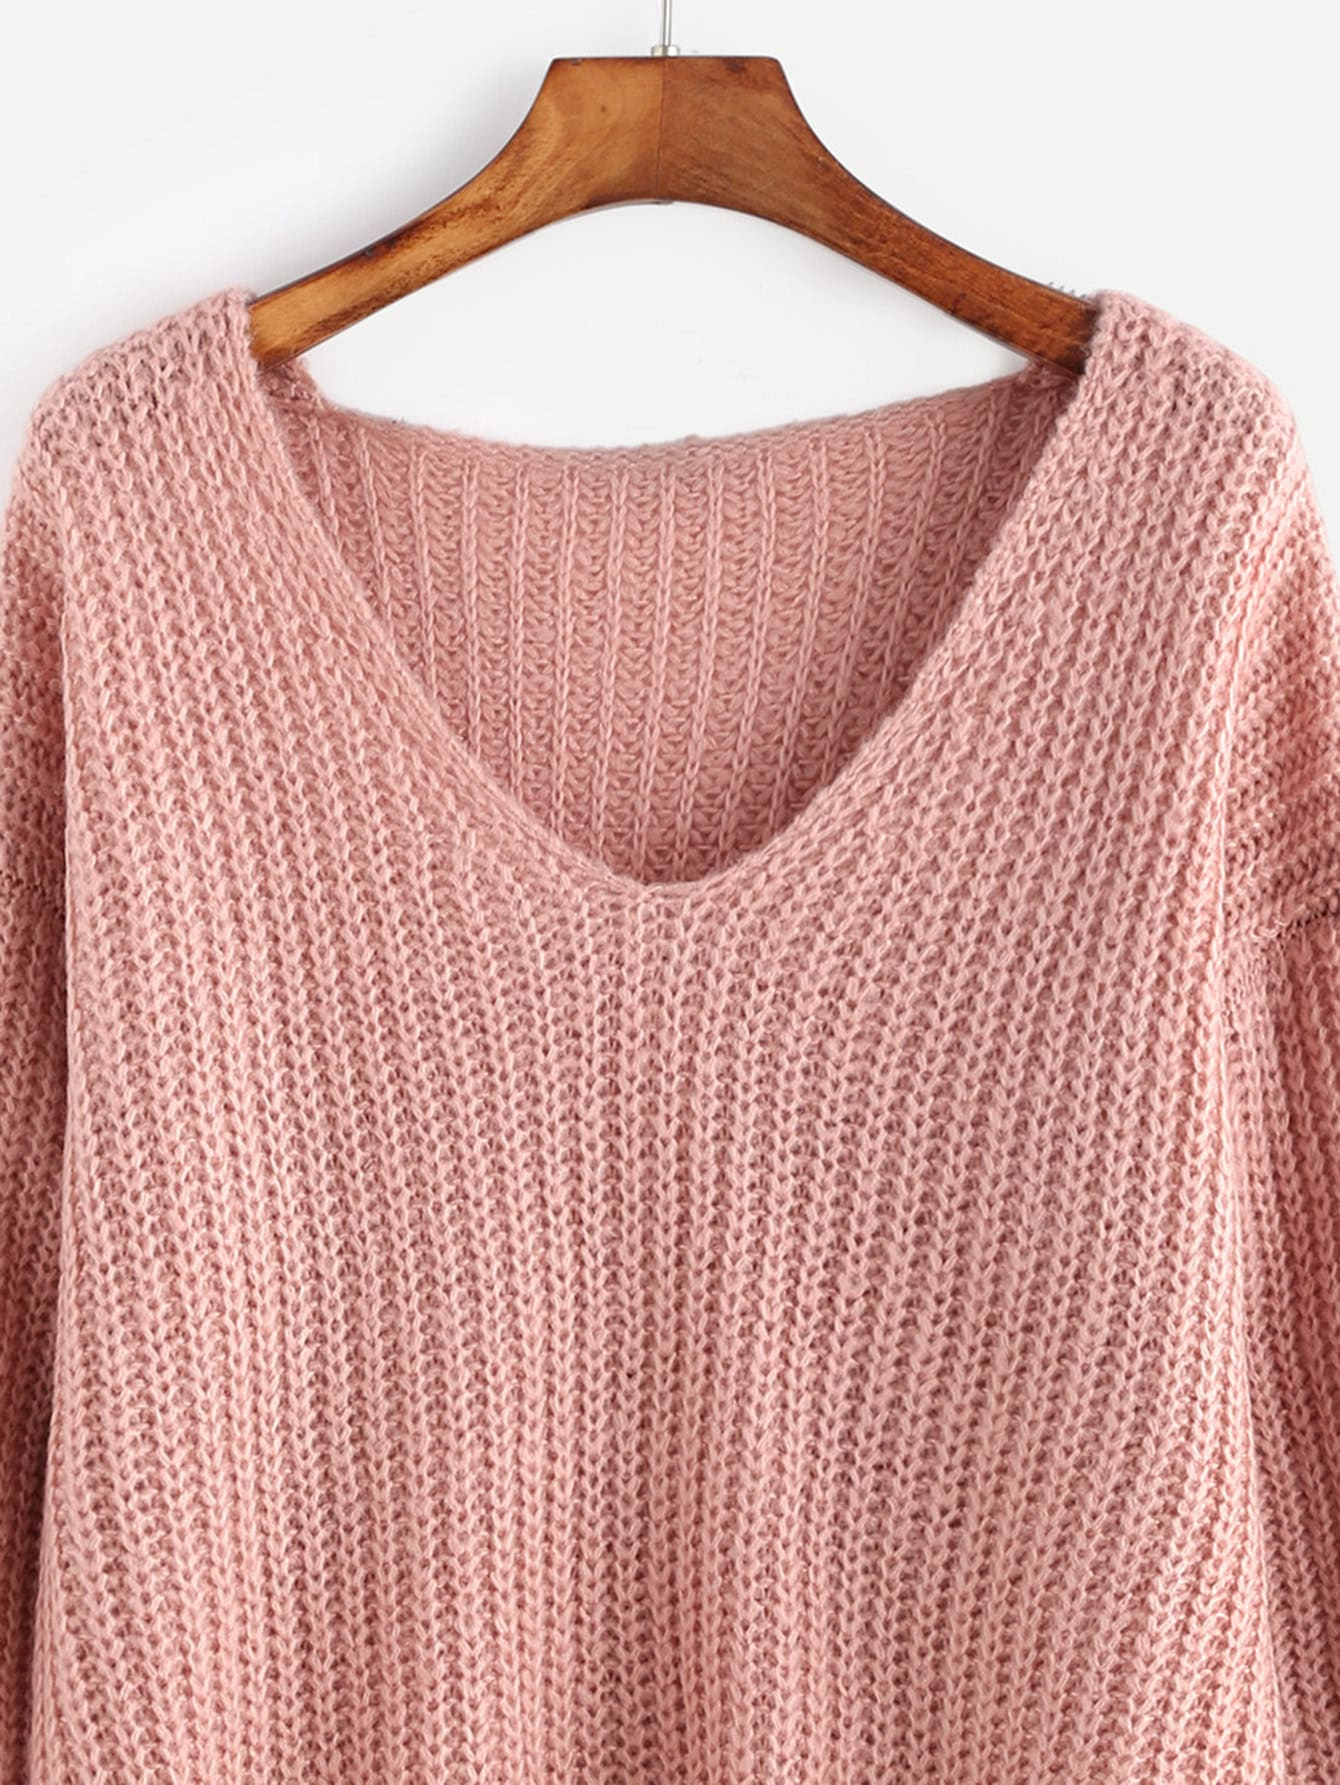 sweater161104402_2